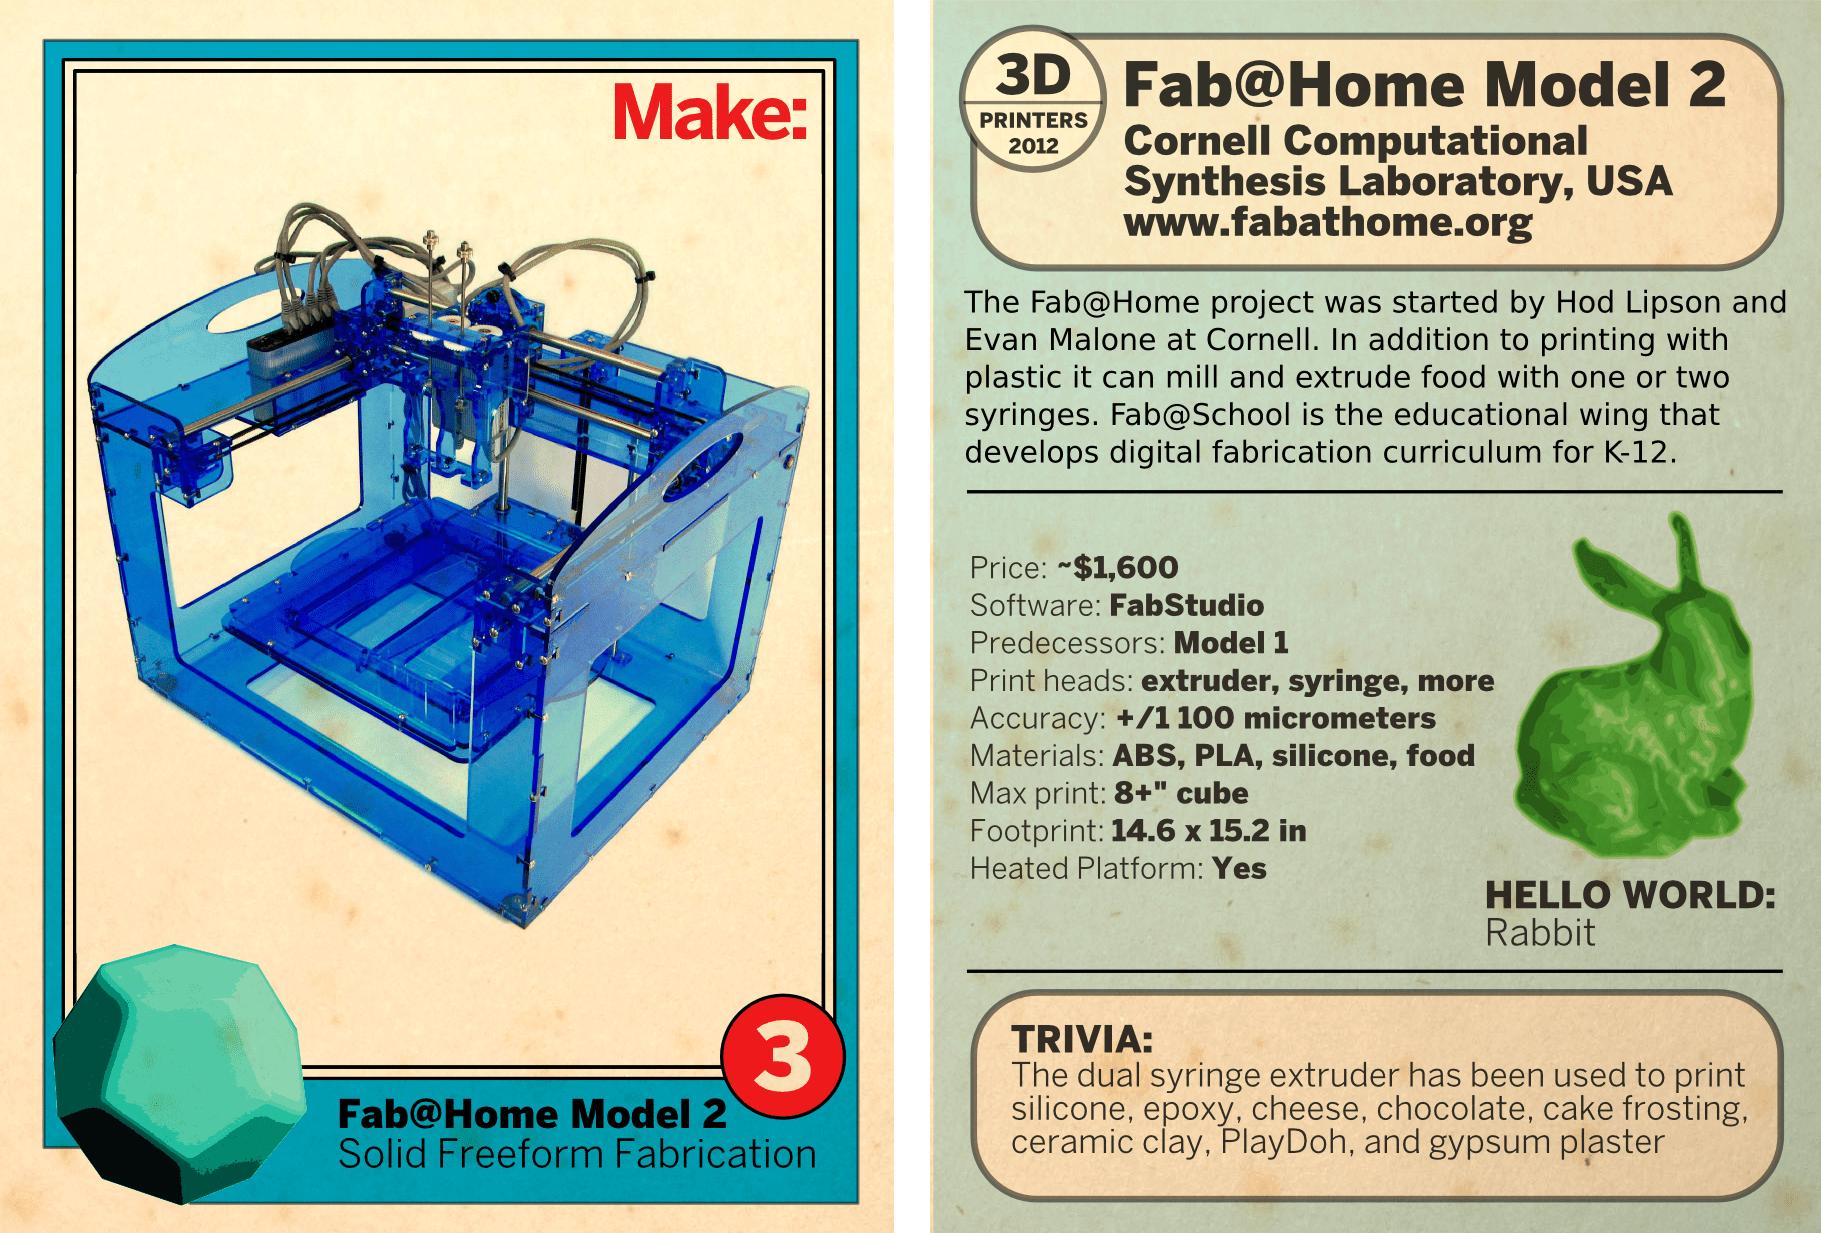 Fab@Home Model 2